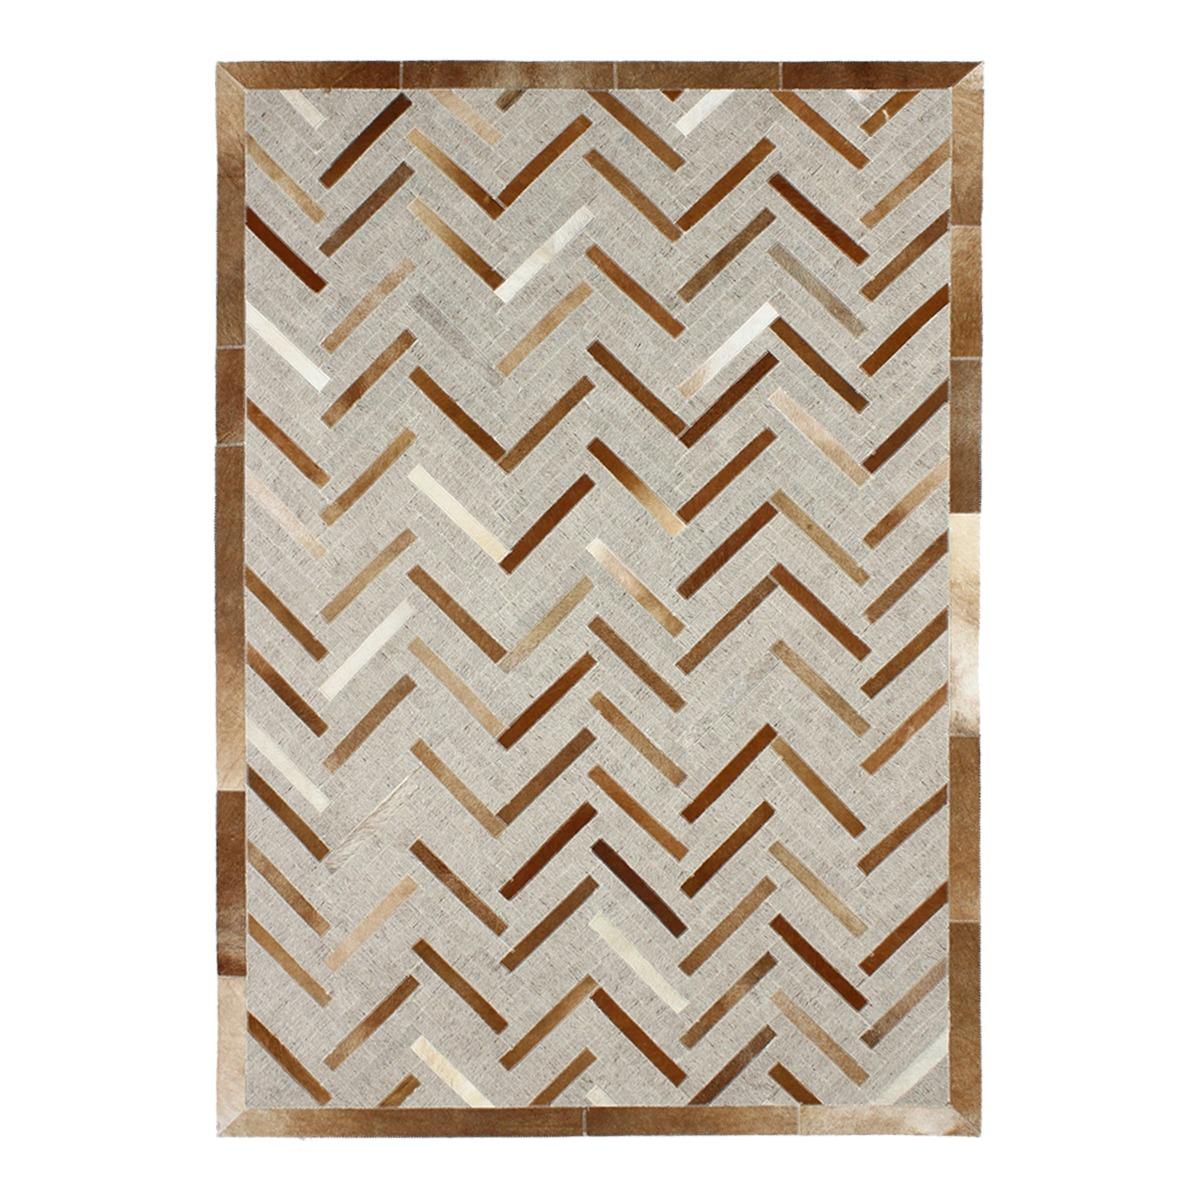 Tapis en cuir à motif chevron marron clair 120x170